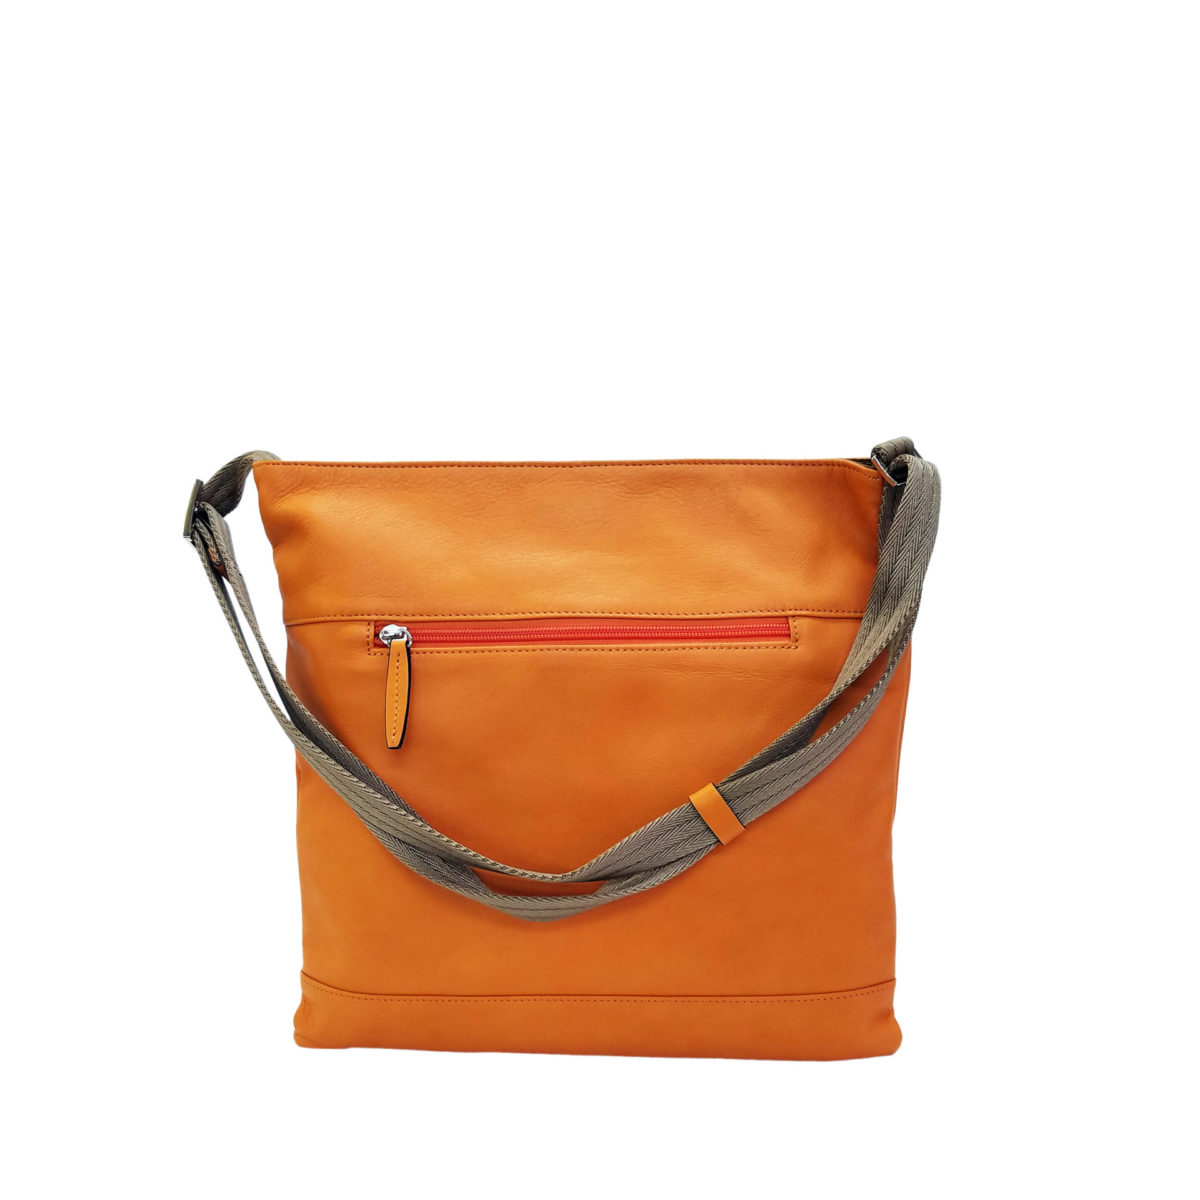 Leather Misto sacoche orange | caede京都